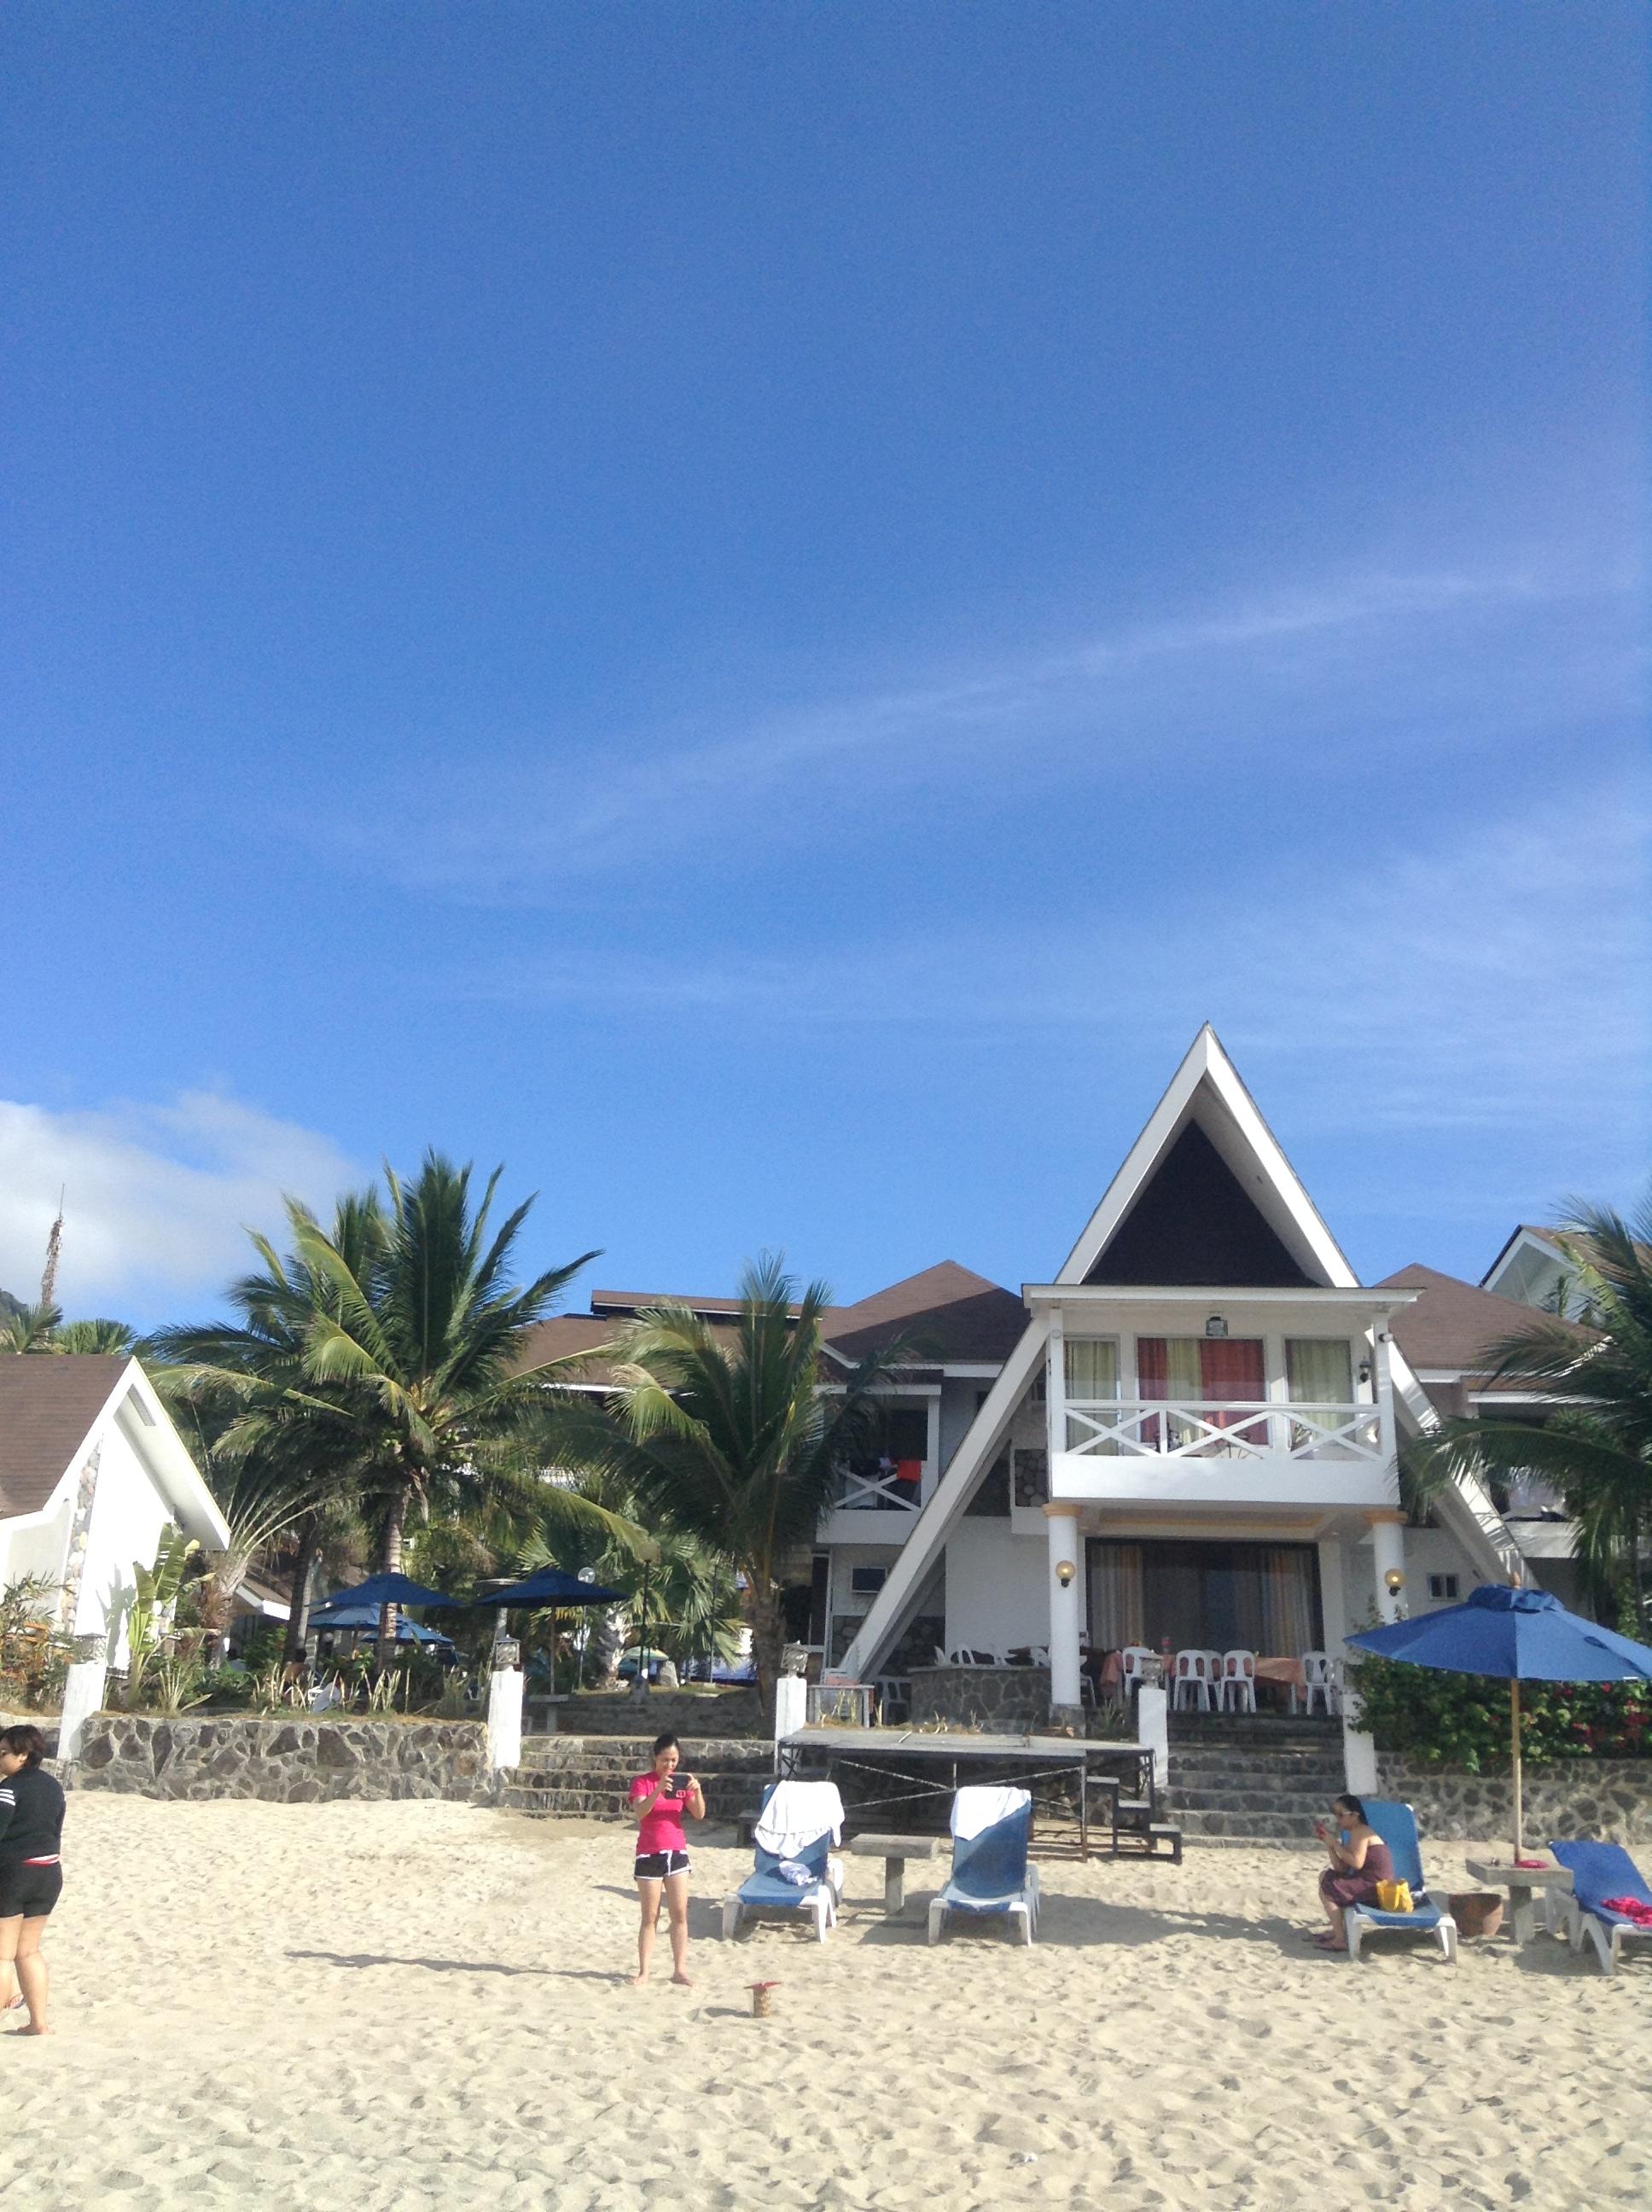 single s escape at blue coral beach resort our journey. Black Bedroom Furniture Sets. Home Design Ideas